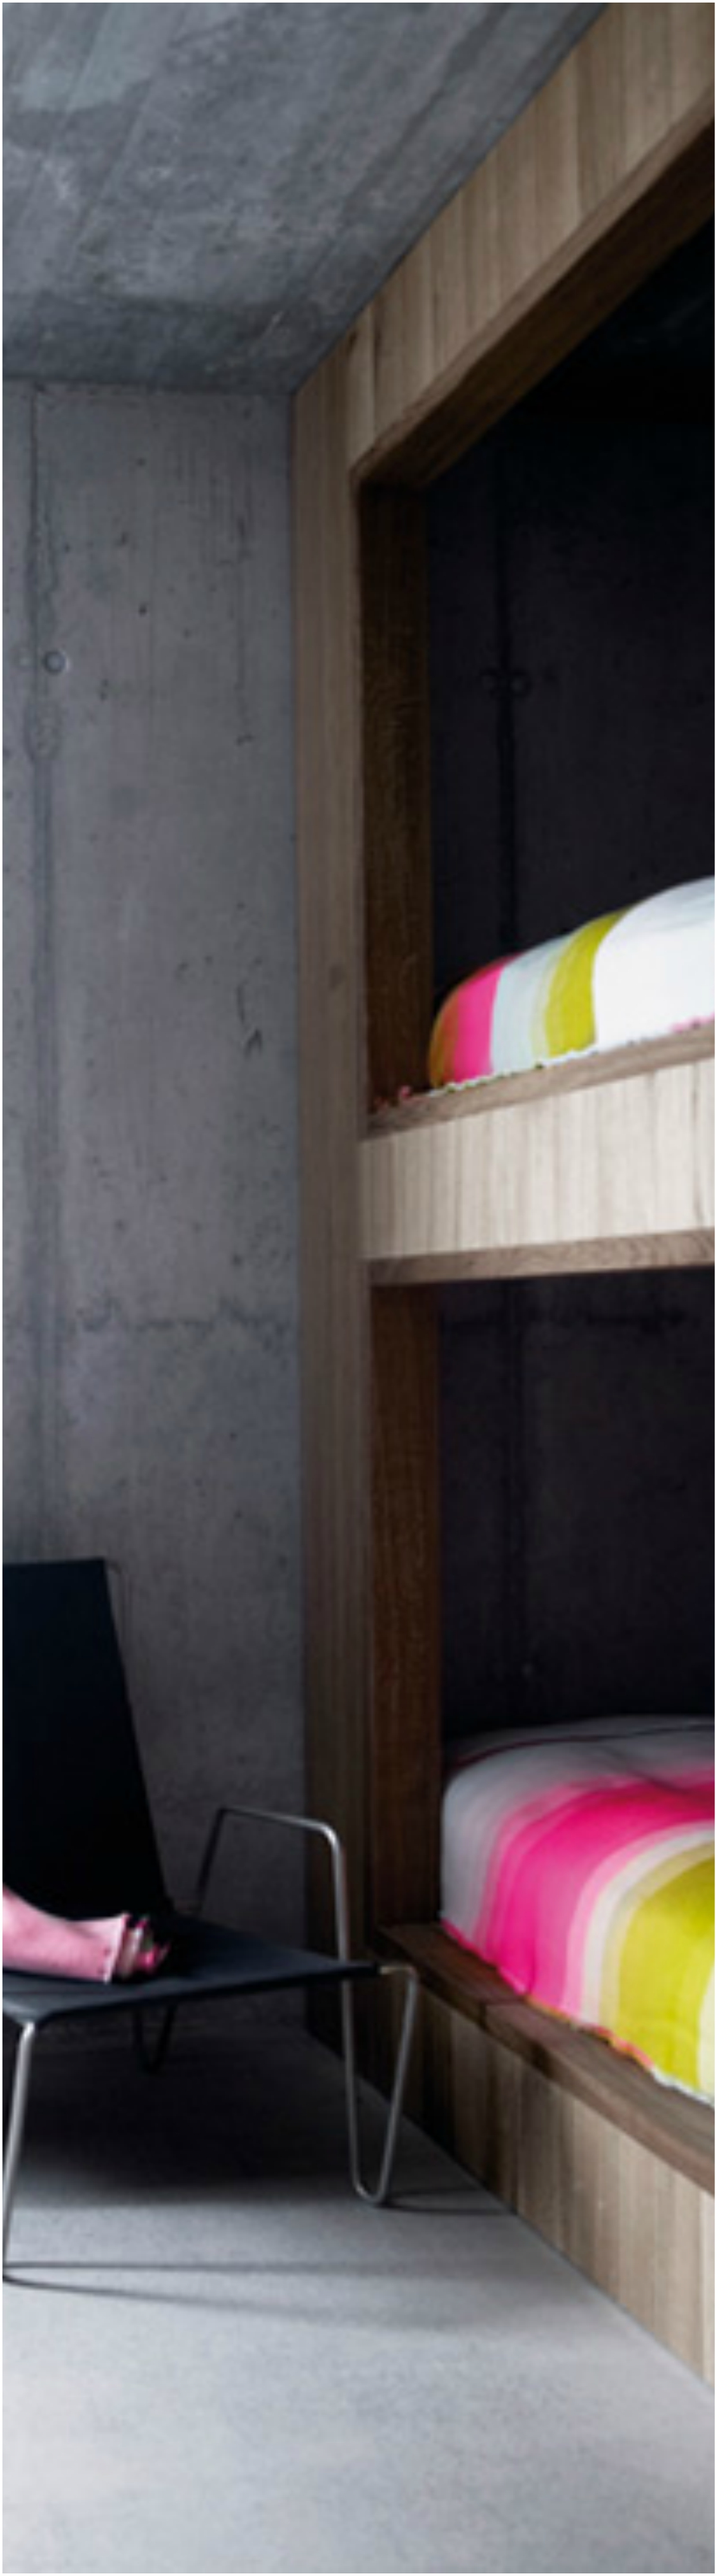 Stunning Bedroom Decor Ideas thewowdecor (5)